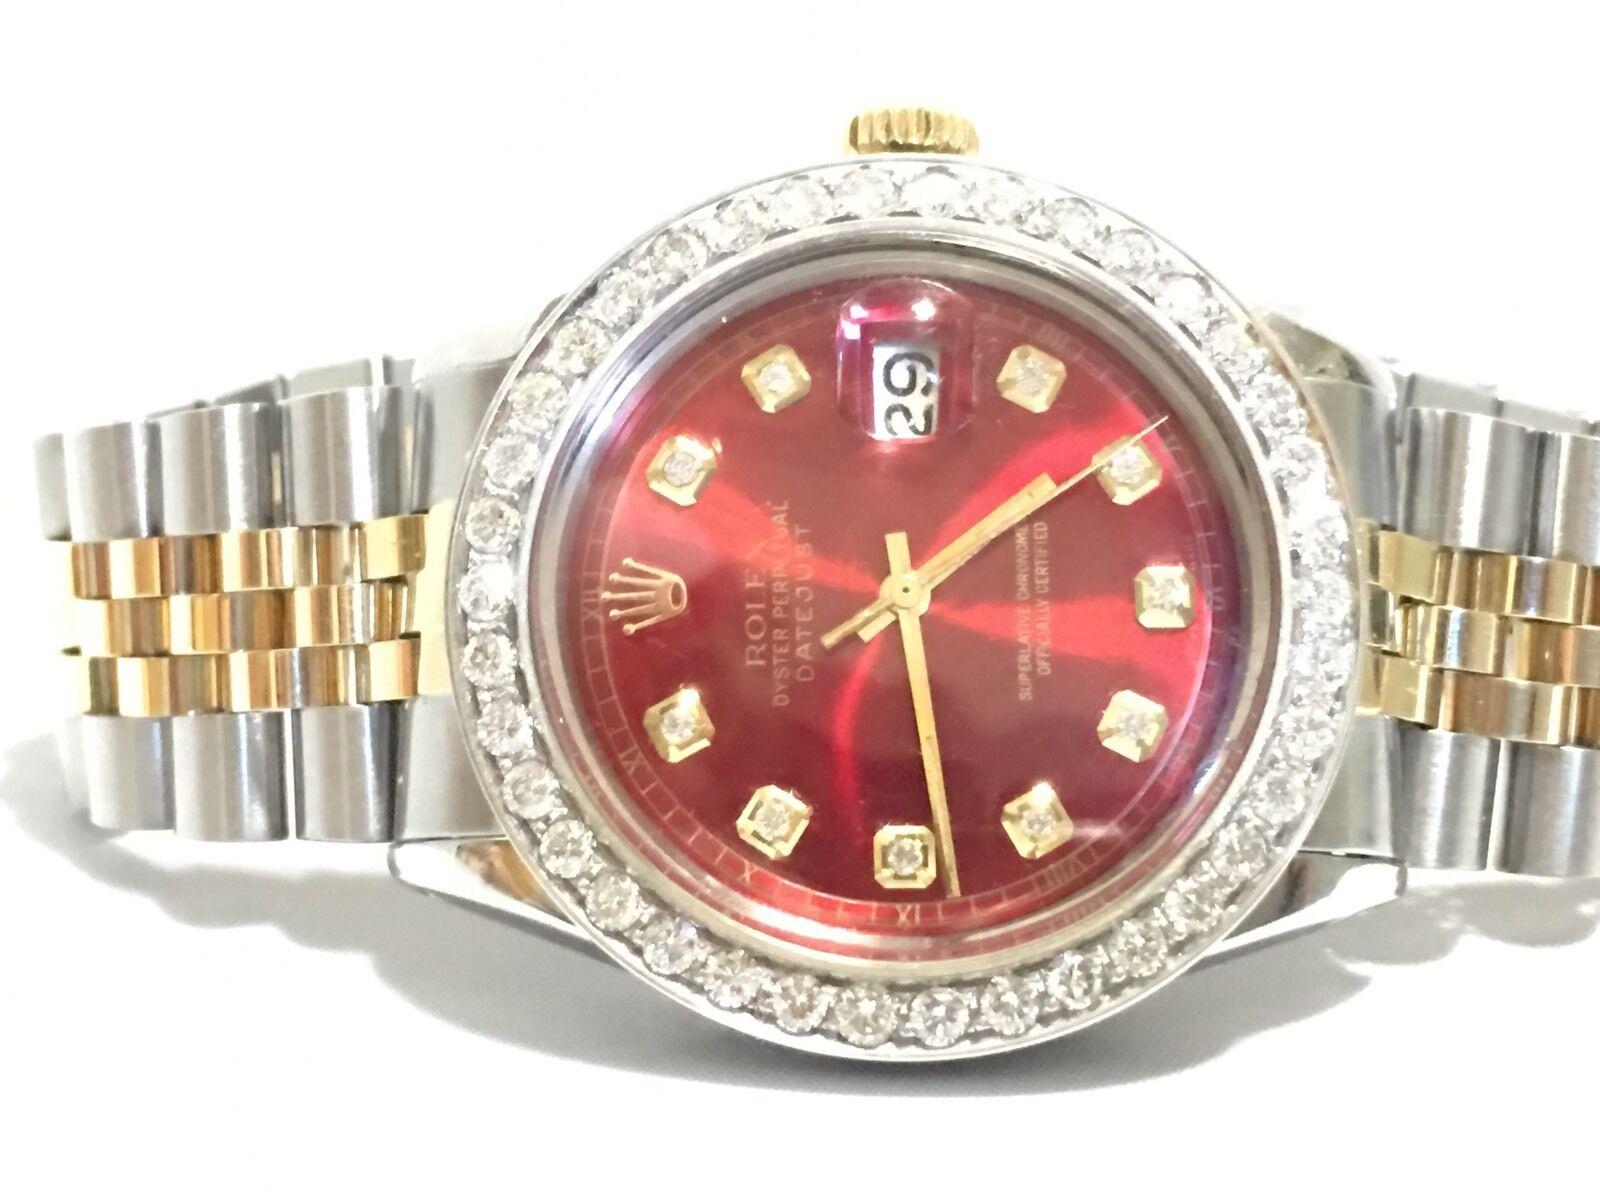 Rolex mens two tone diamond dial diamond Bezel 36mm Datejust automatic watch